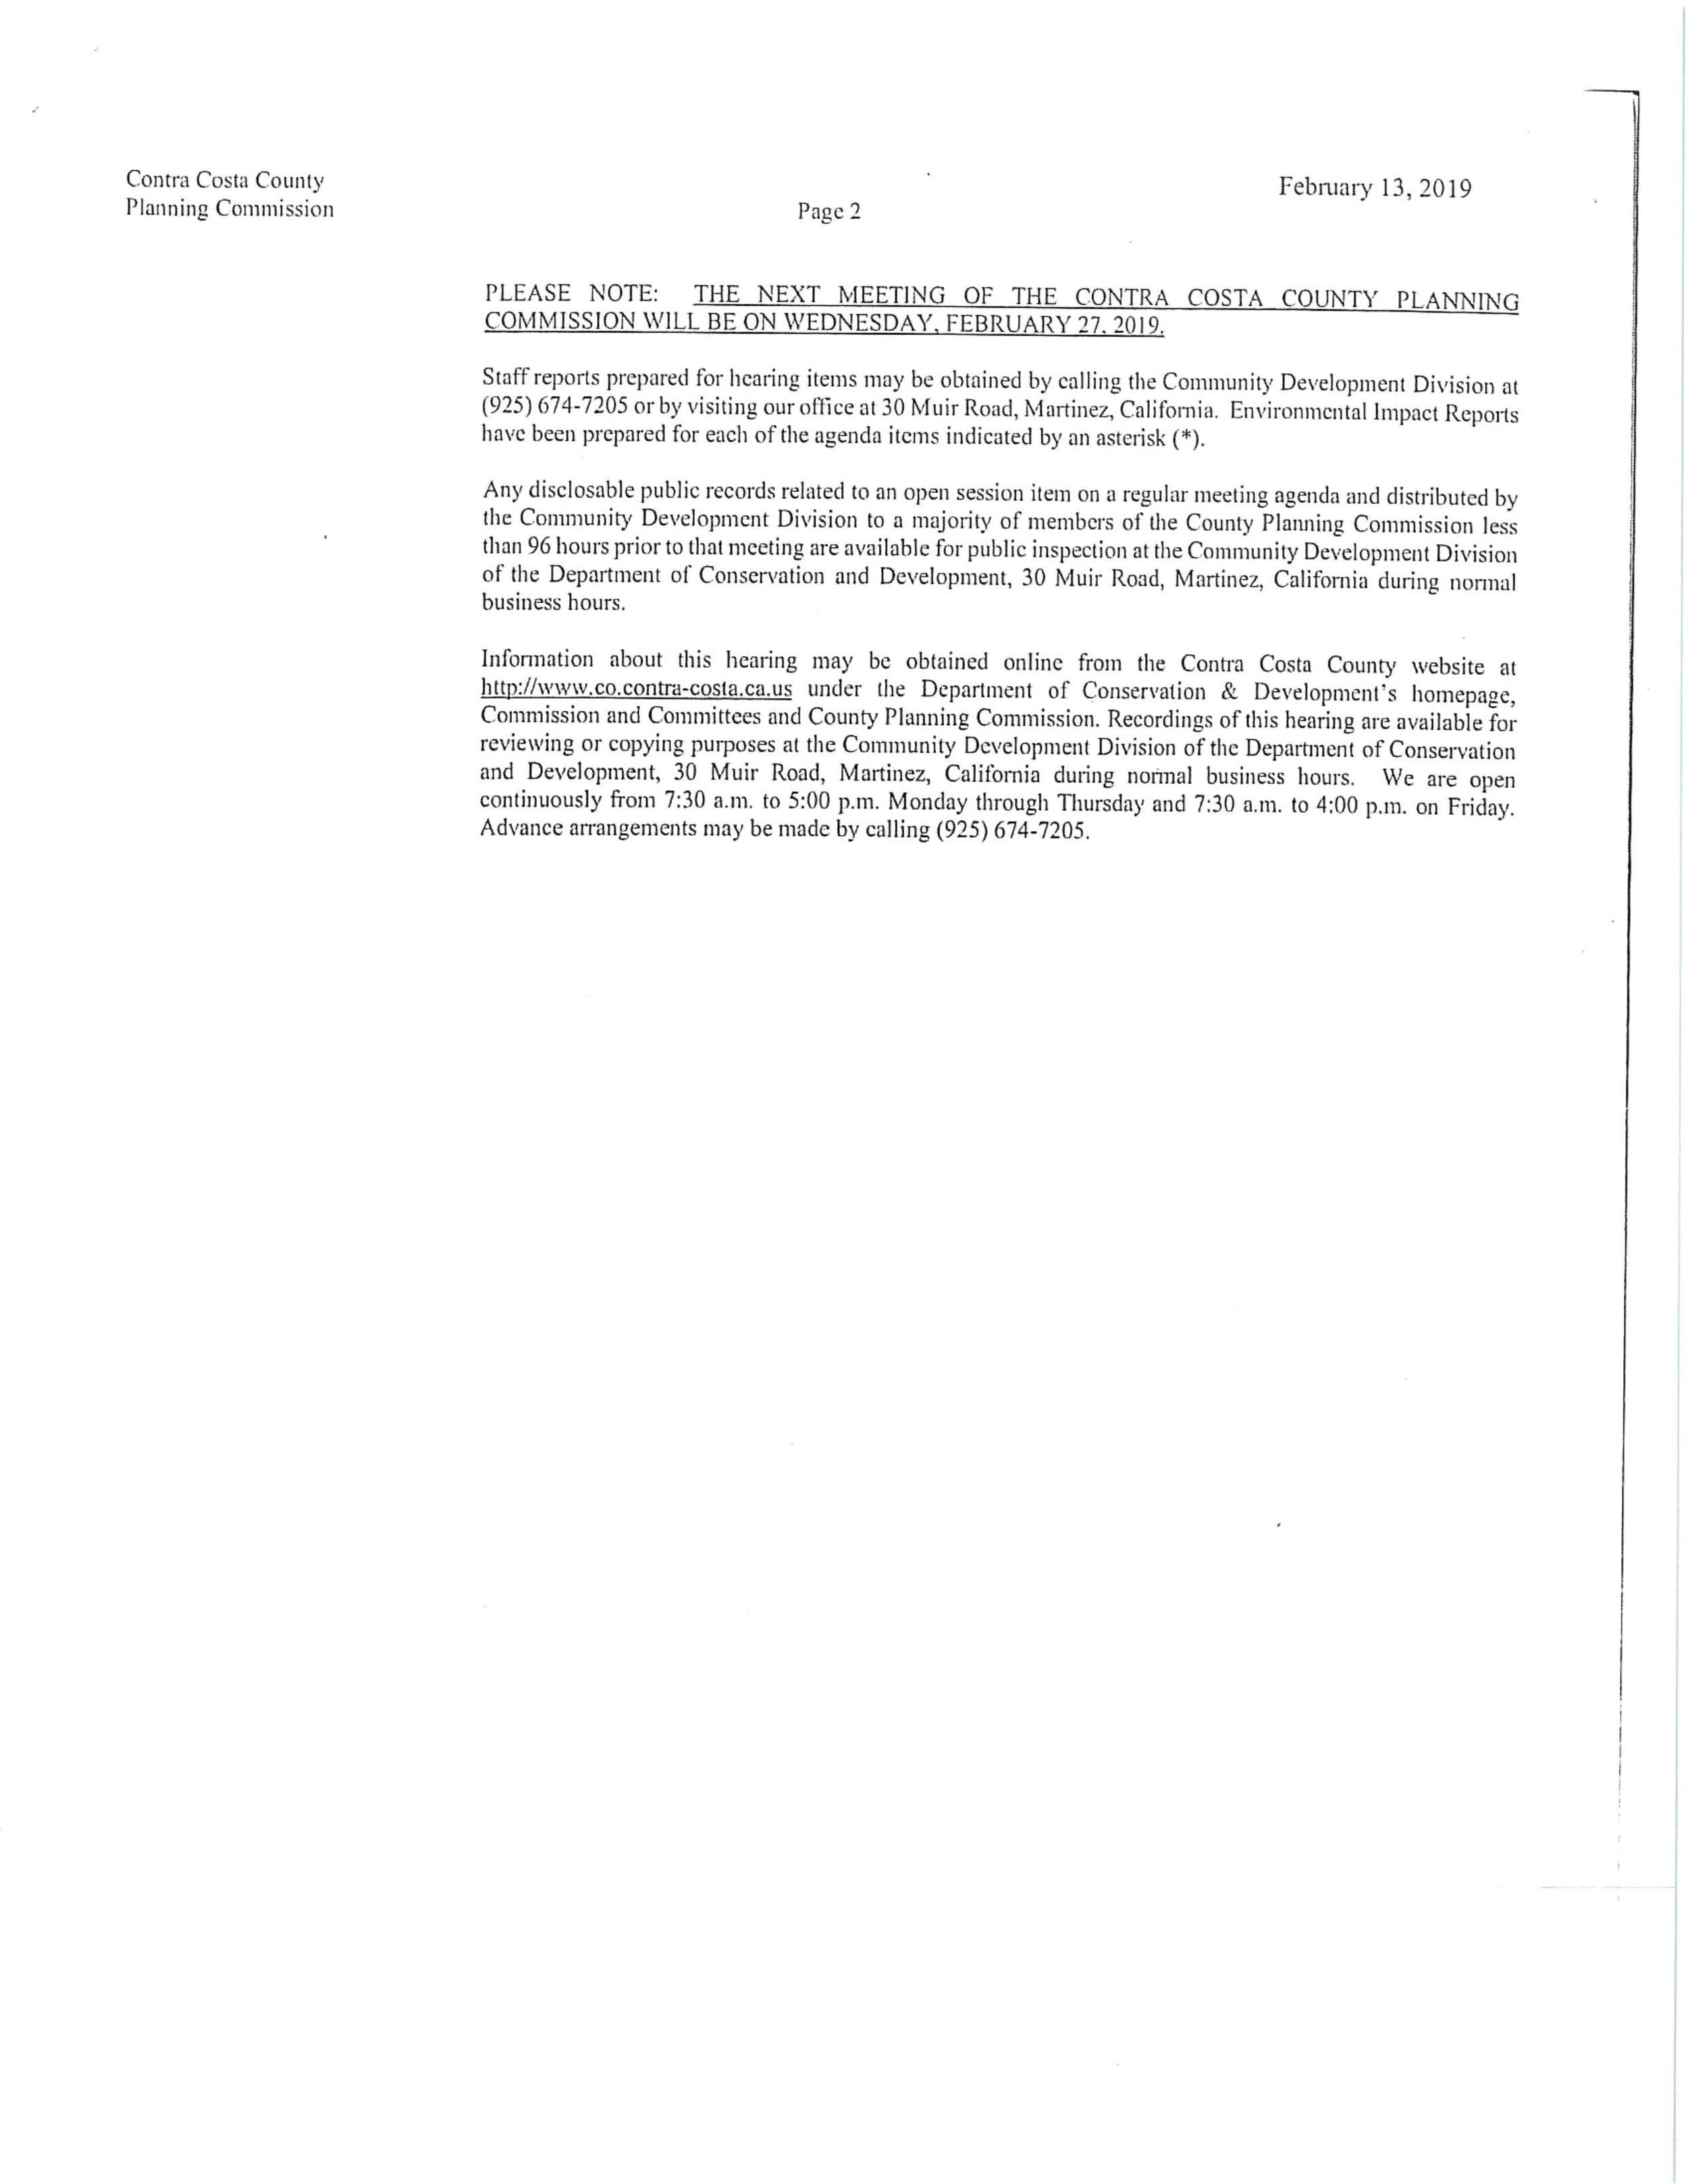 ESMAC Agenda 2.13.2019b_45.jpg